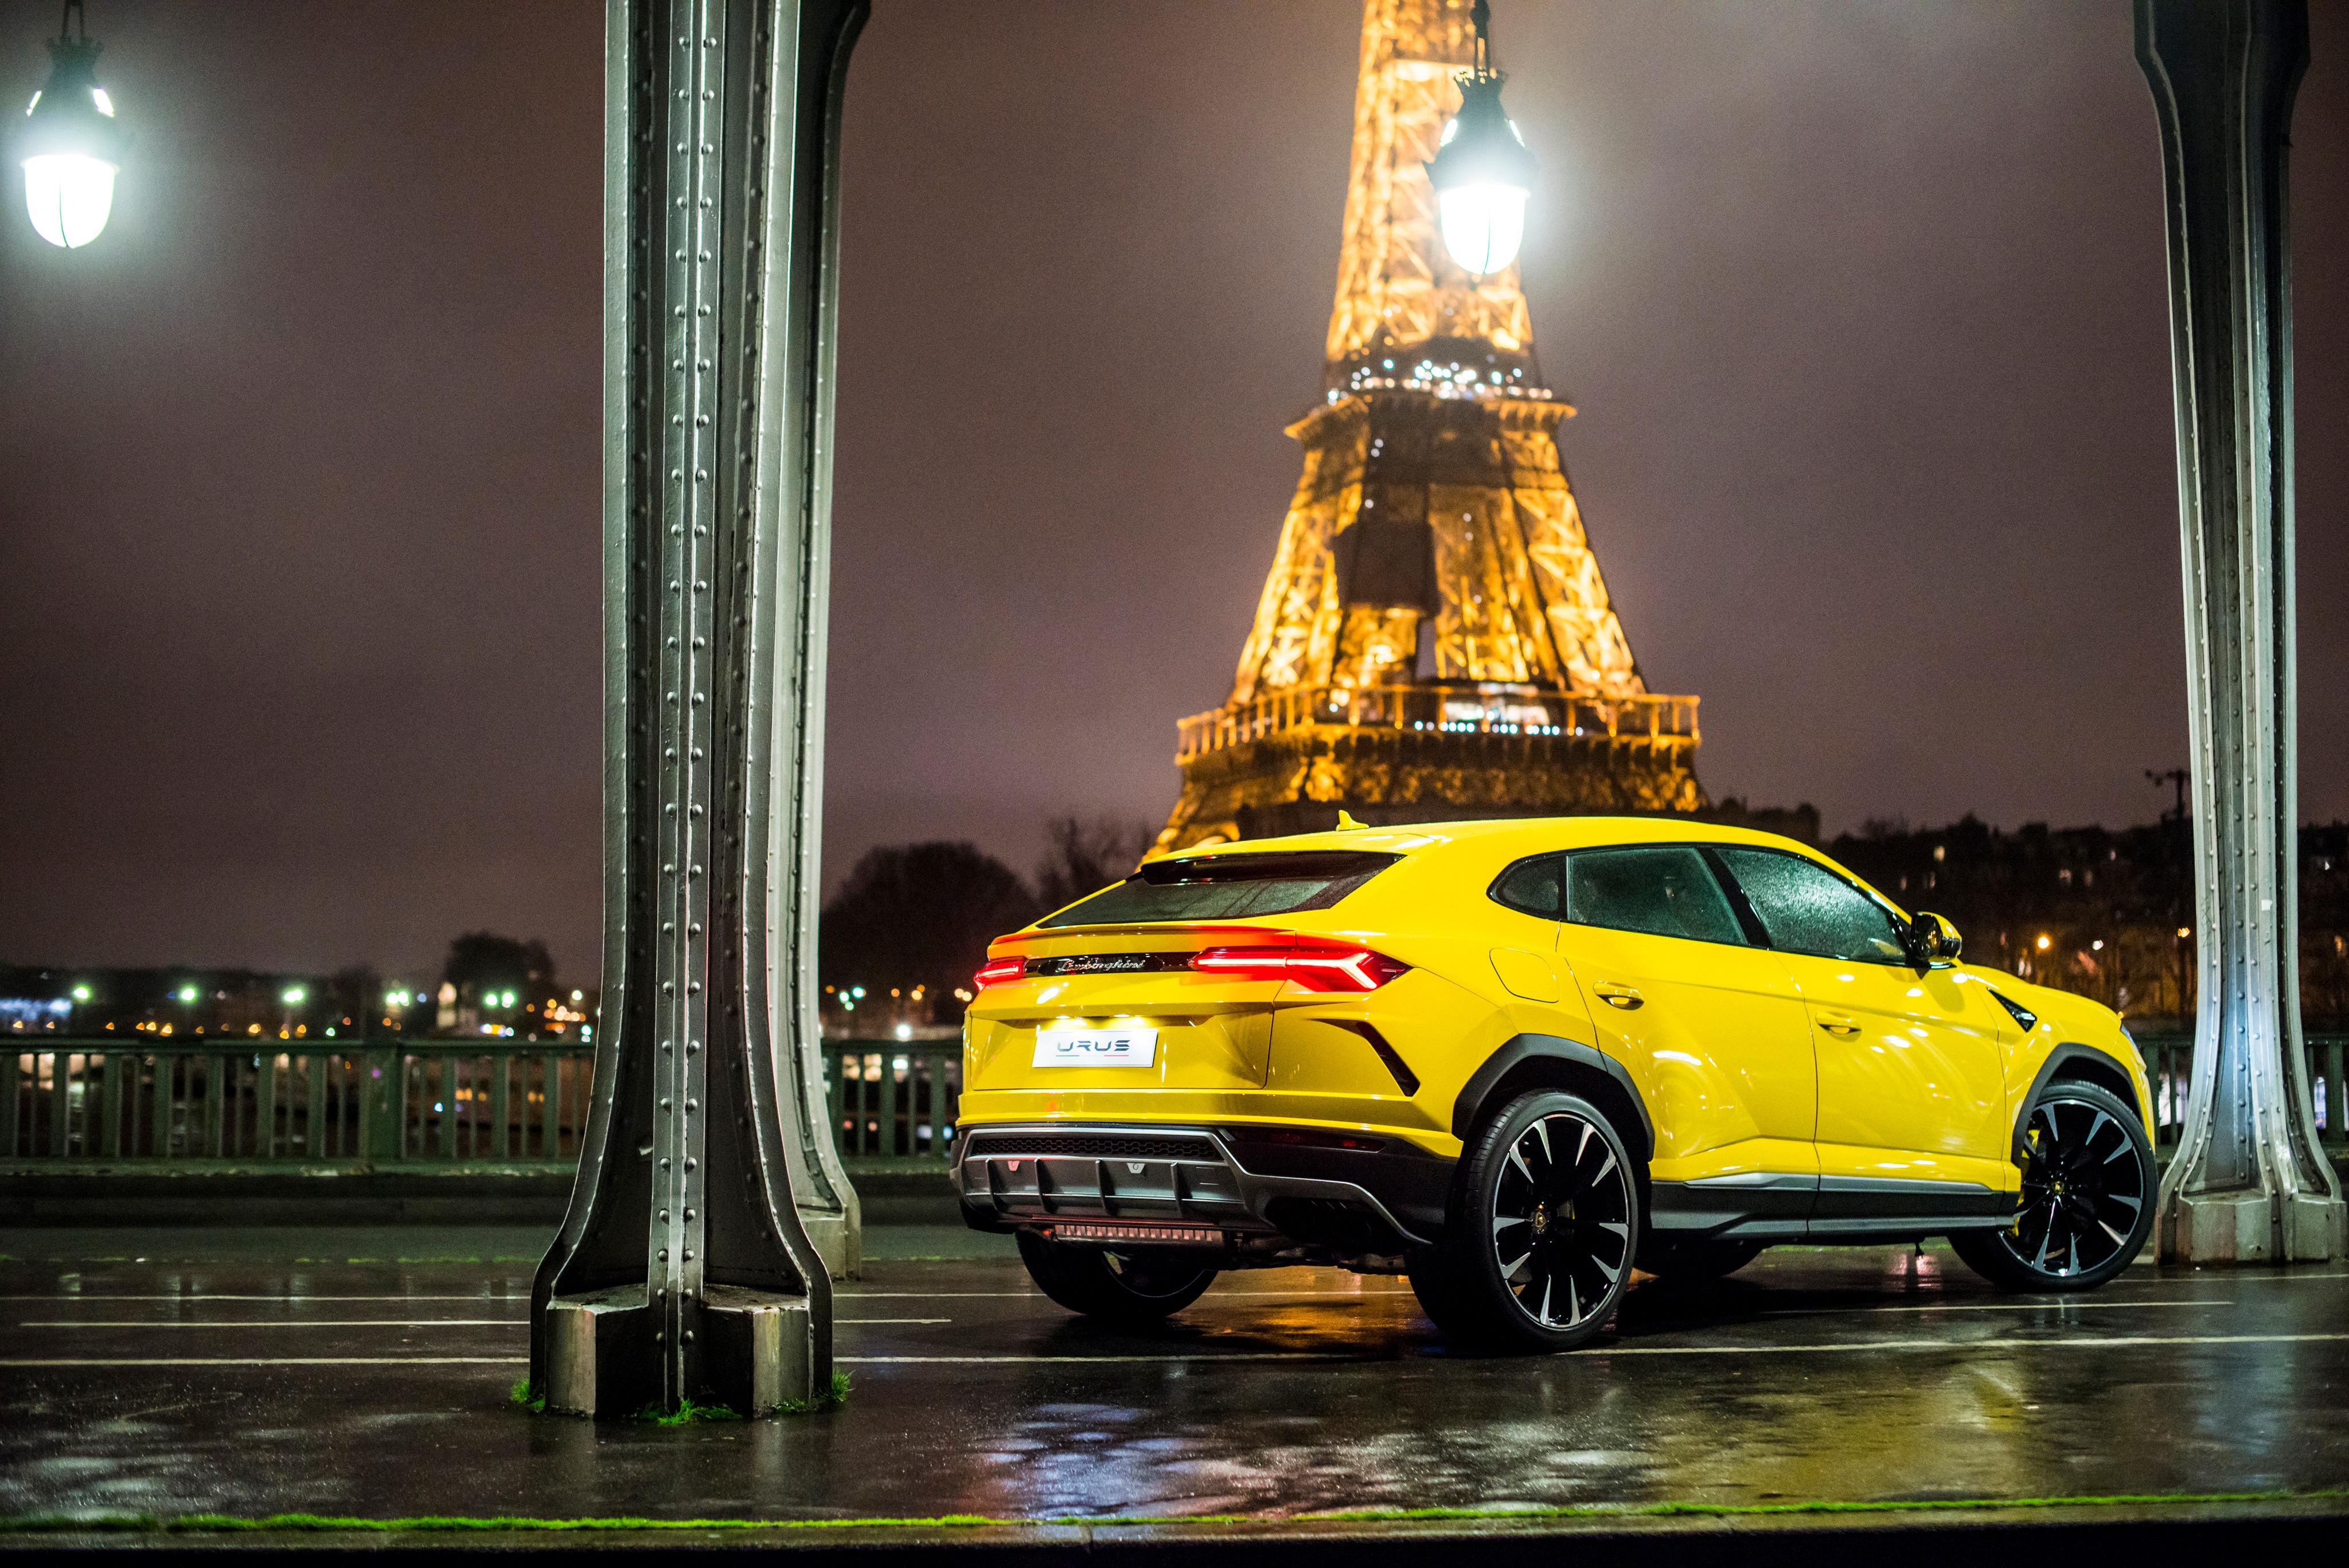 Rear Side Of Lamborghini Urus 4k Hd Cars 4k Wallpapers Images